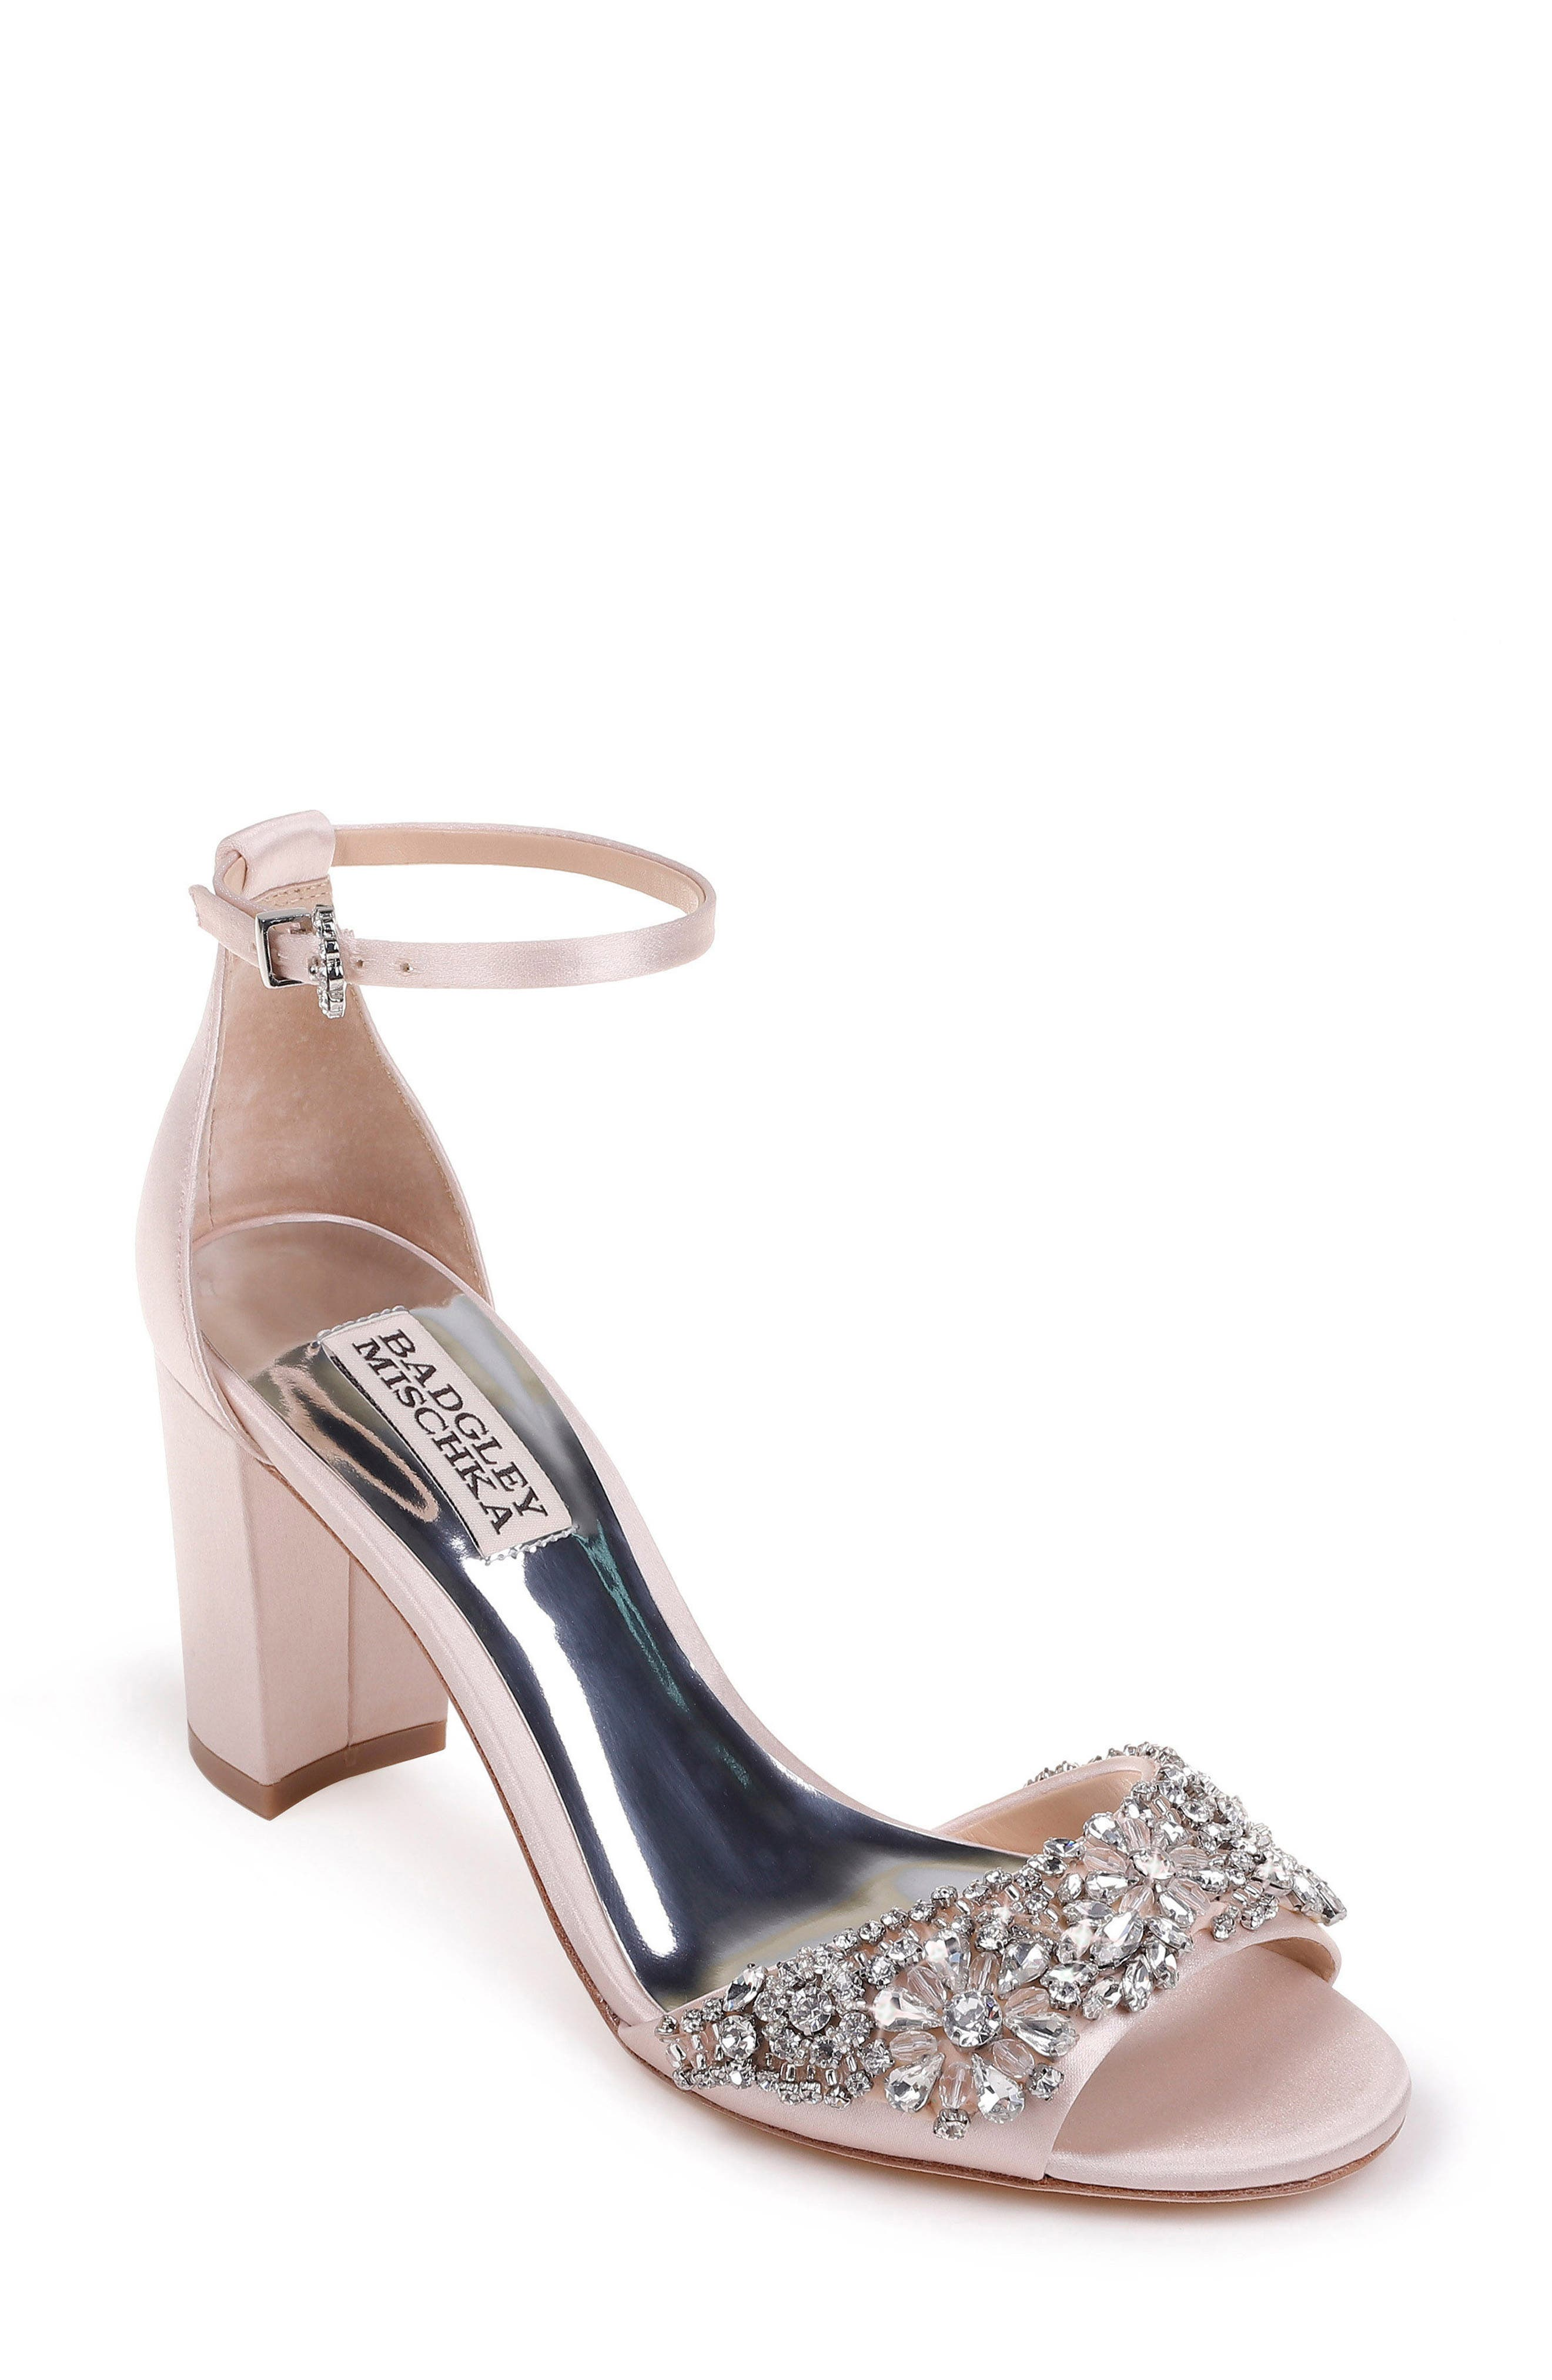 Main Image - Badgley Mischka Hines Embellished Block Heel Sandal (Women)